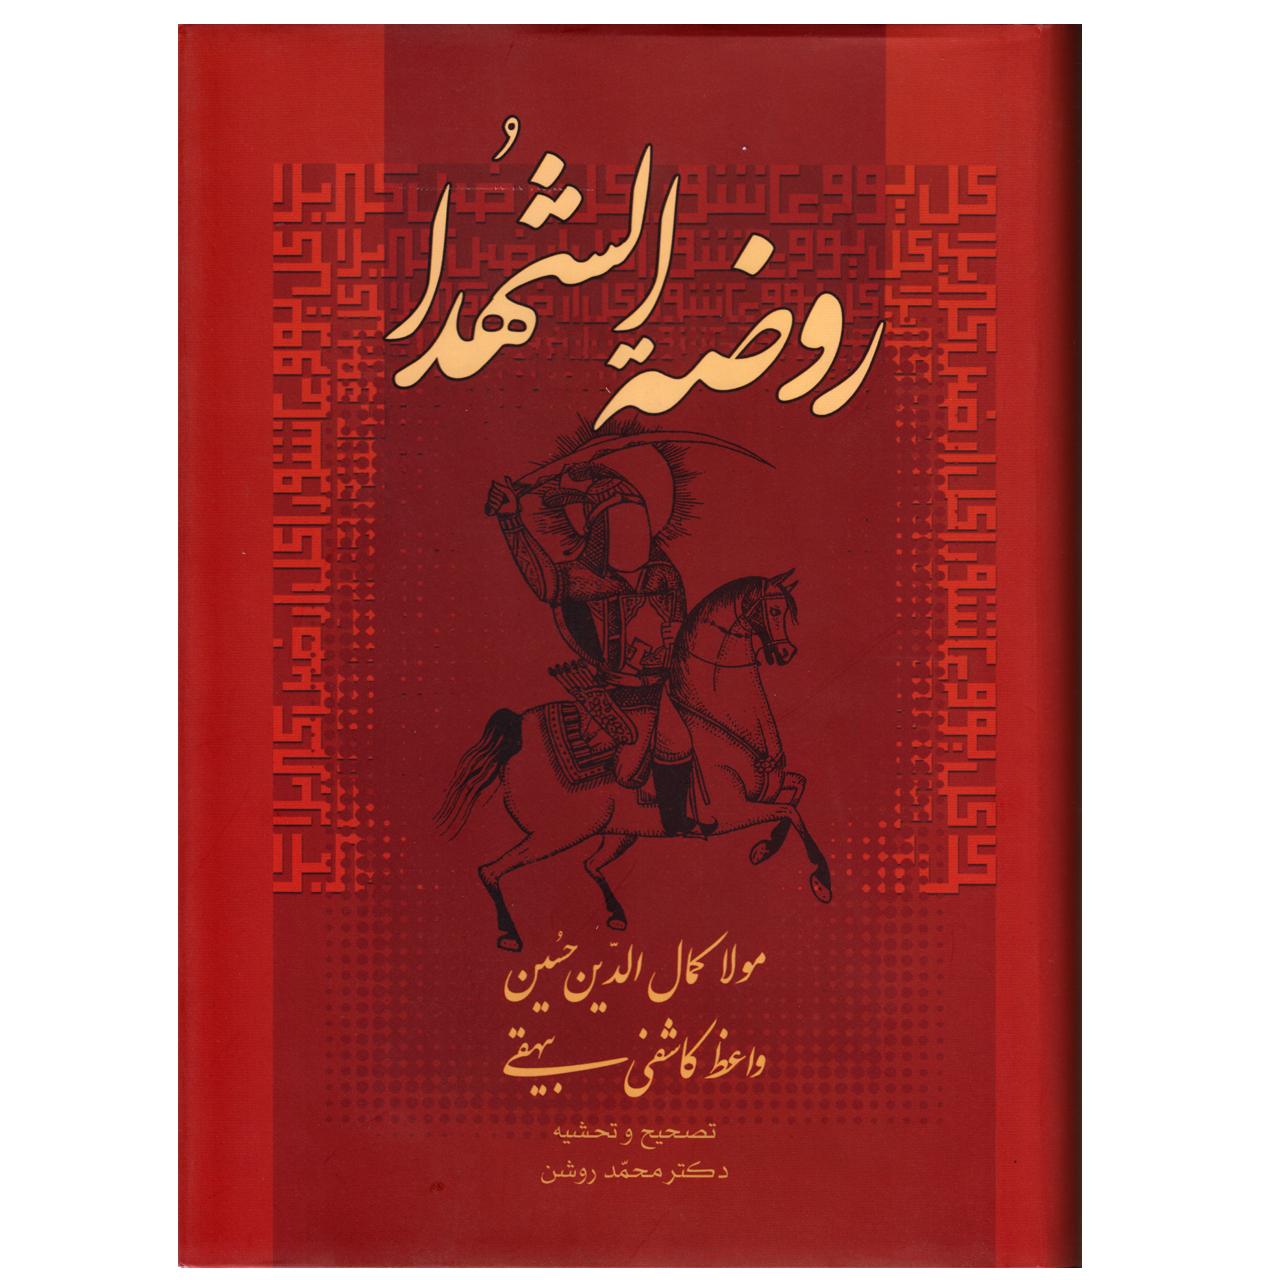 خرید                      كتاب روضه الشهدا اثر واعظ كاشفي بيهقي نشر صداي معاصر